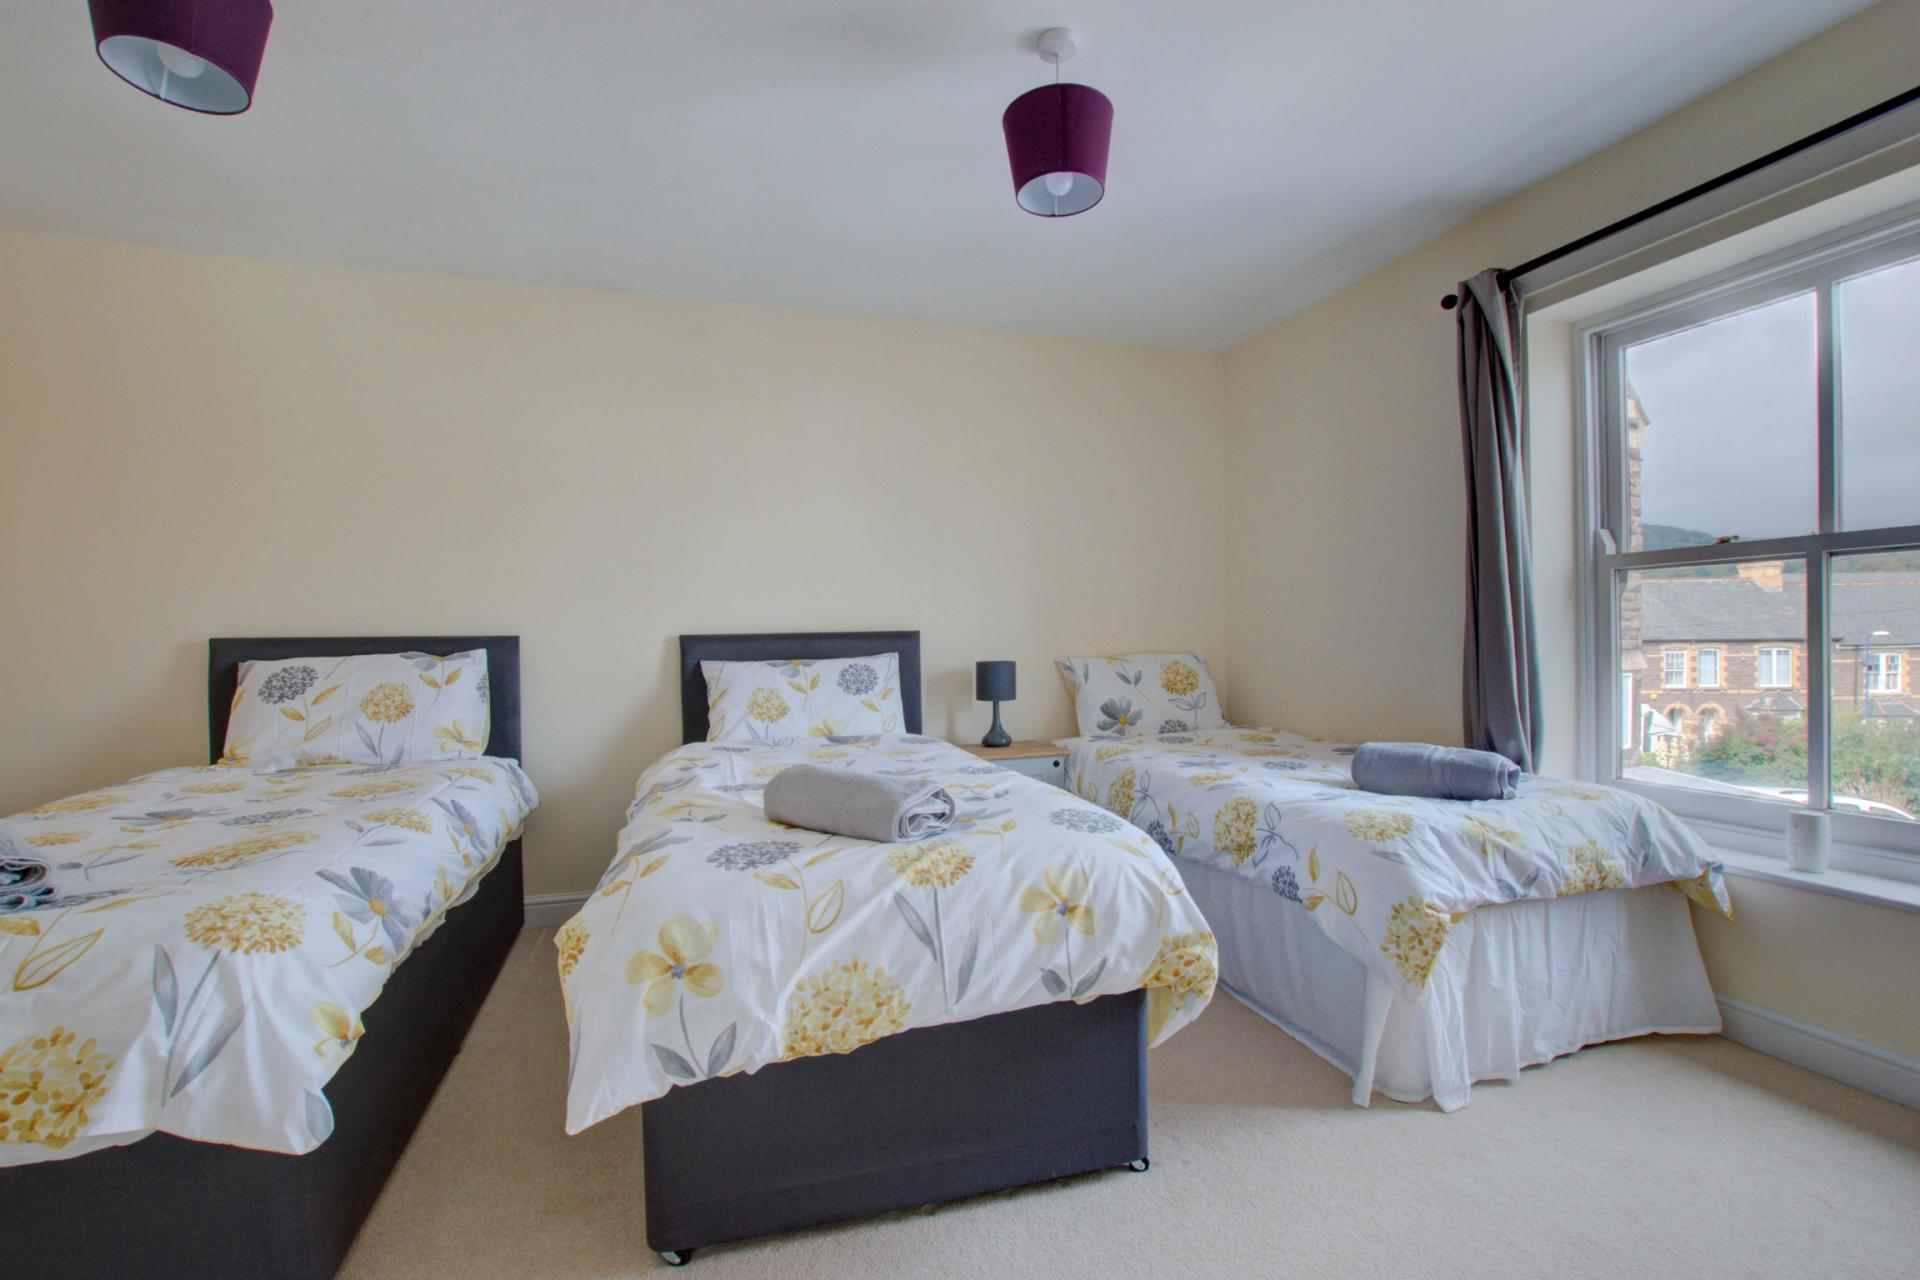 Three bed bedroom at Sherlock Holmes Apartments - Citybase Apartments